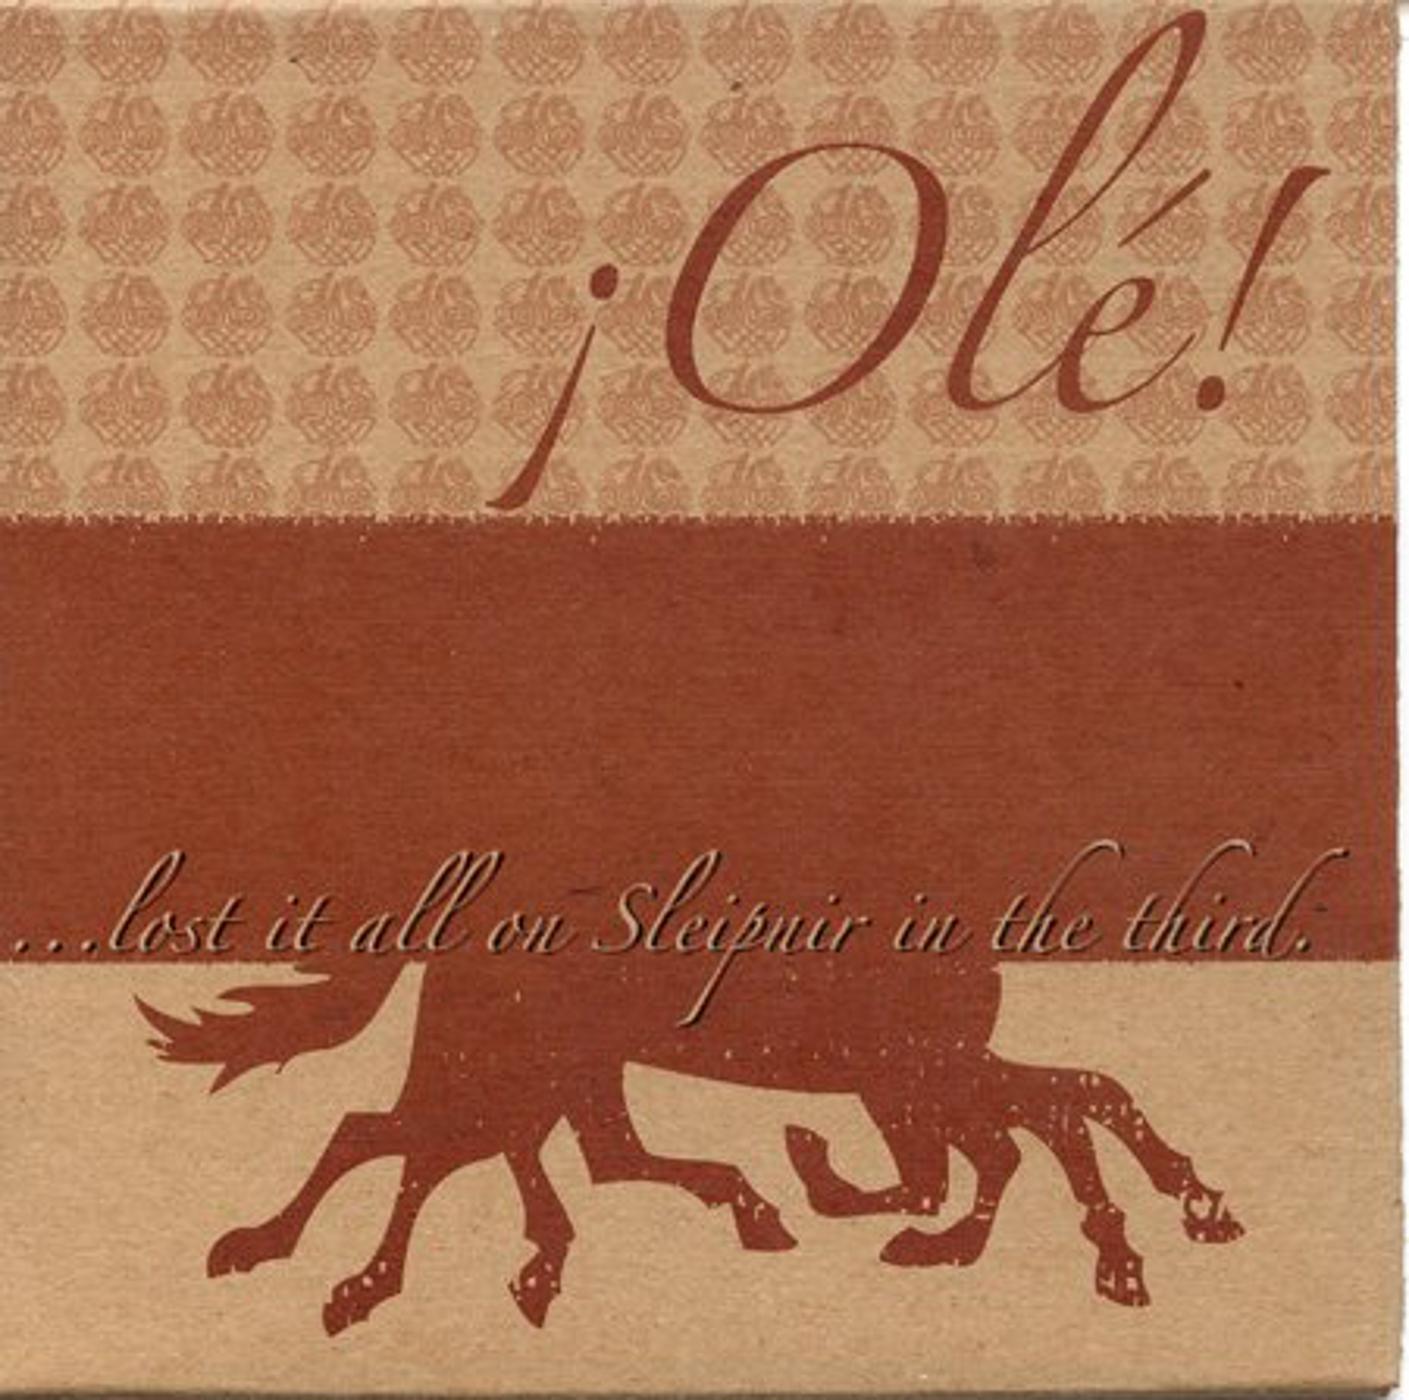 ...lost is all on Sleipnir in the third <br /> ¡Olé!